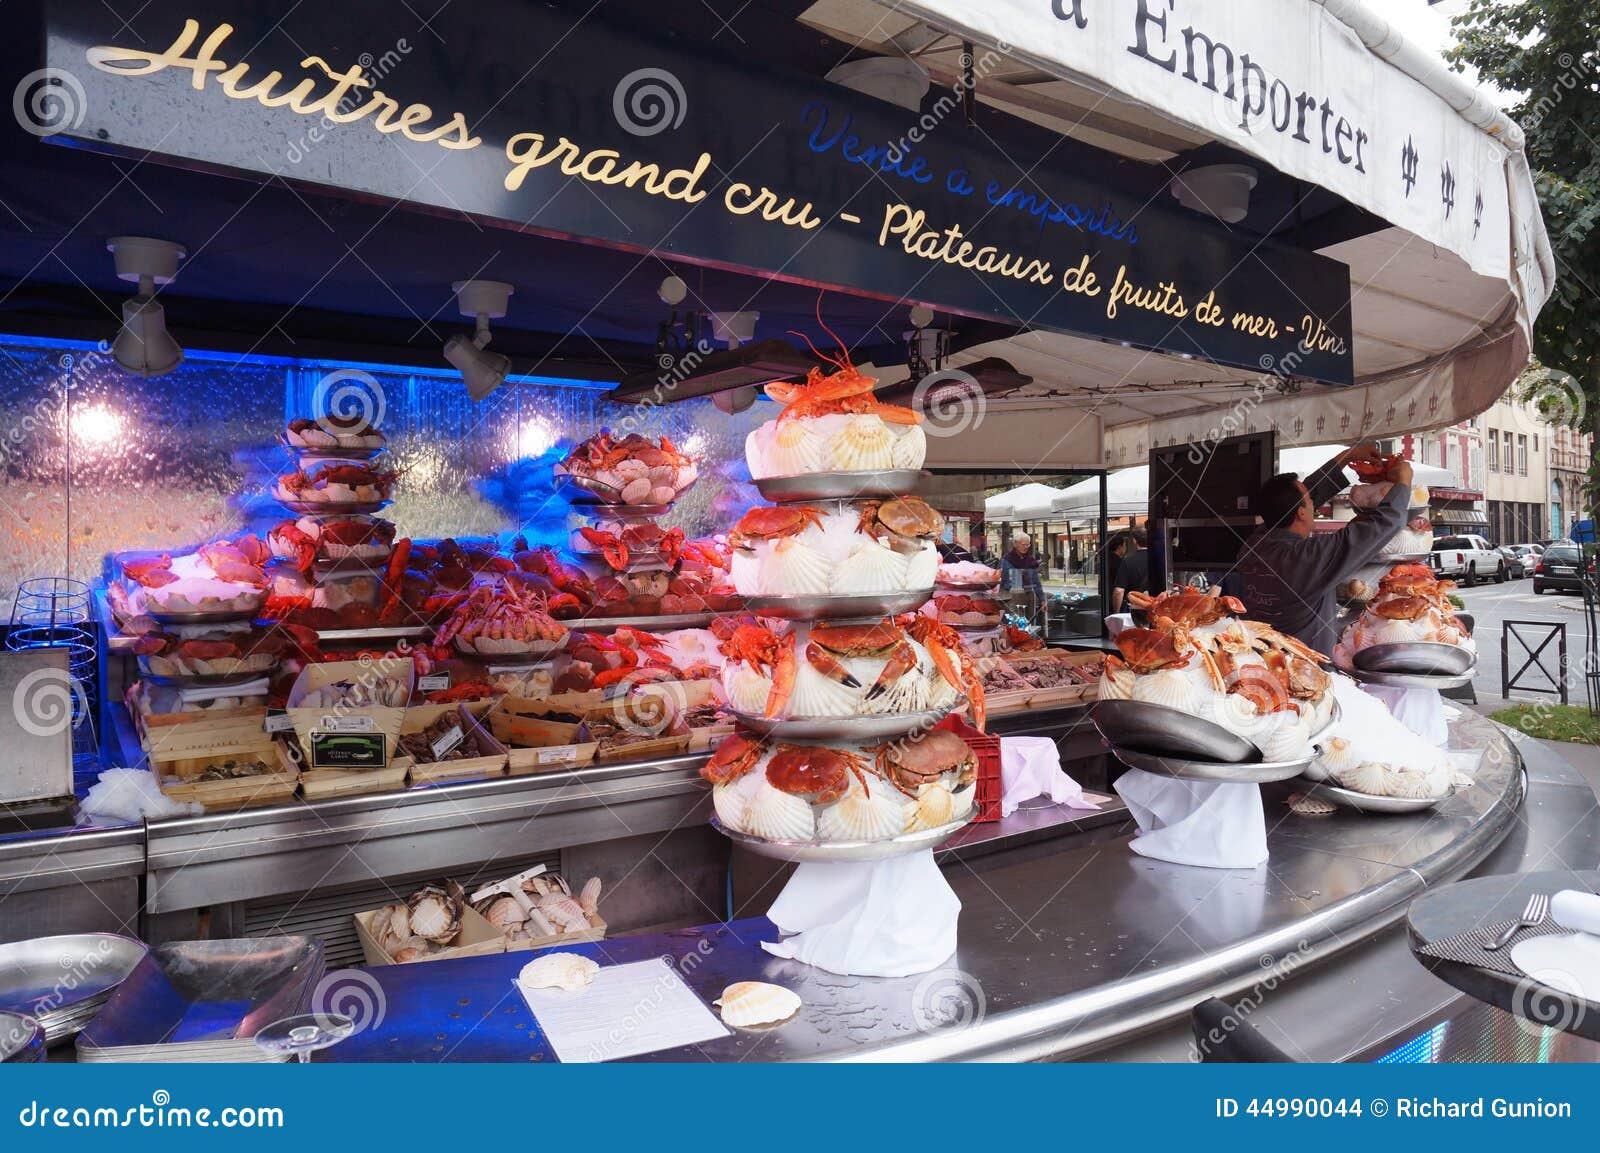 Paris Seafood Restaurant Editorial Stock Image - Image: 44990044